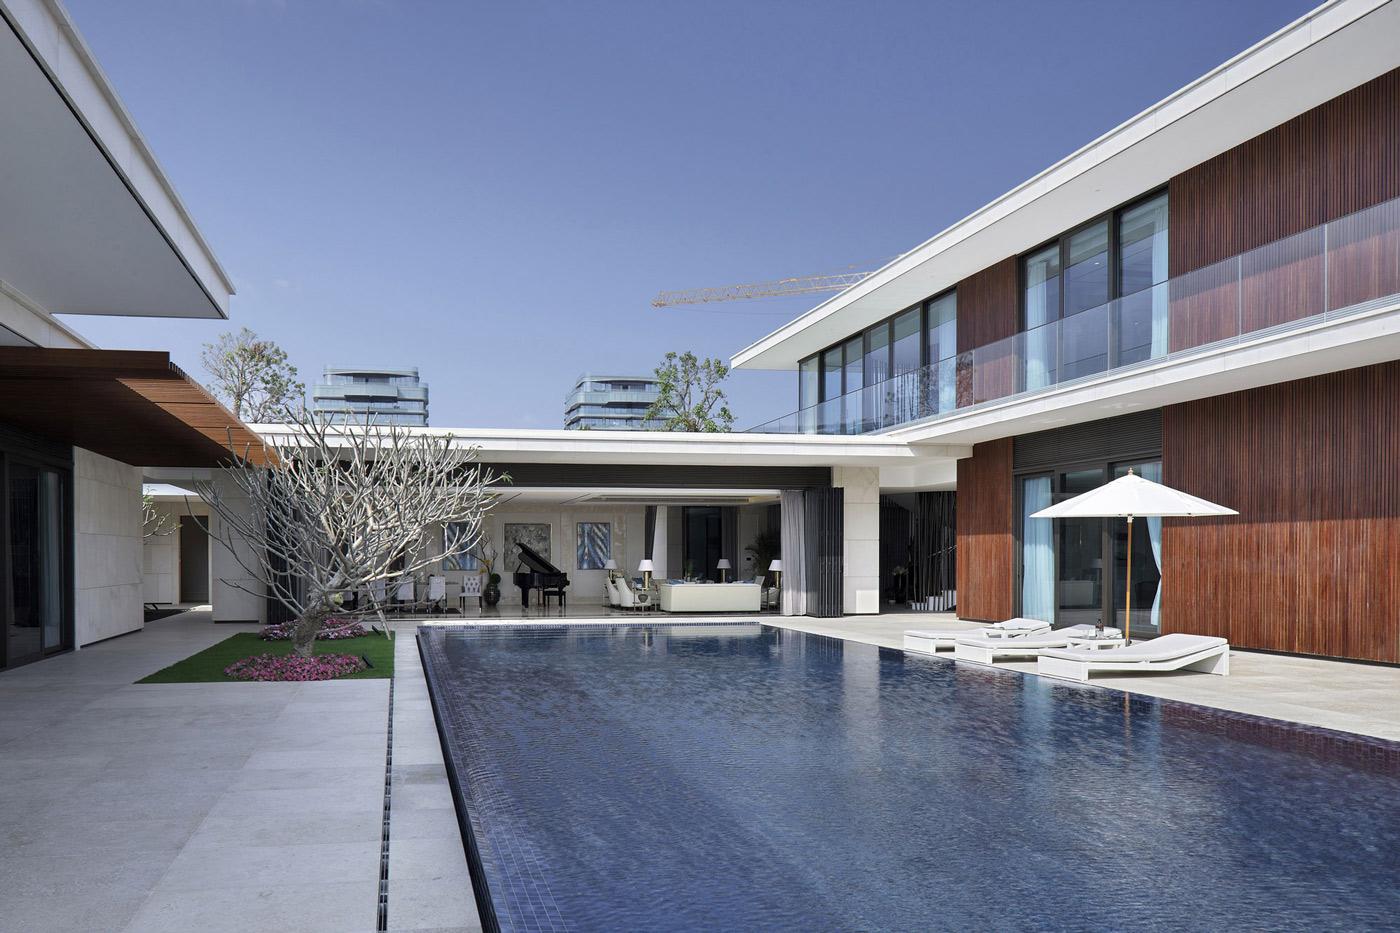 Pool, Terrace, Beachside Villas in Lingshui, Hainan, China